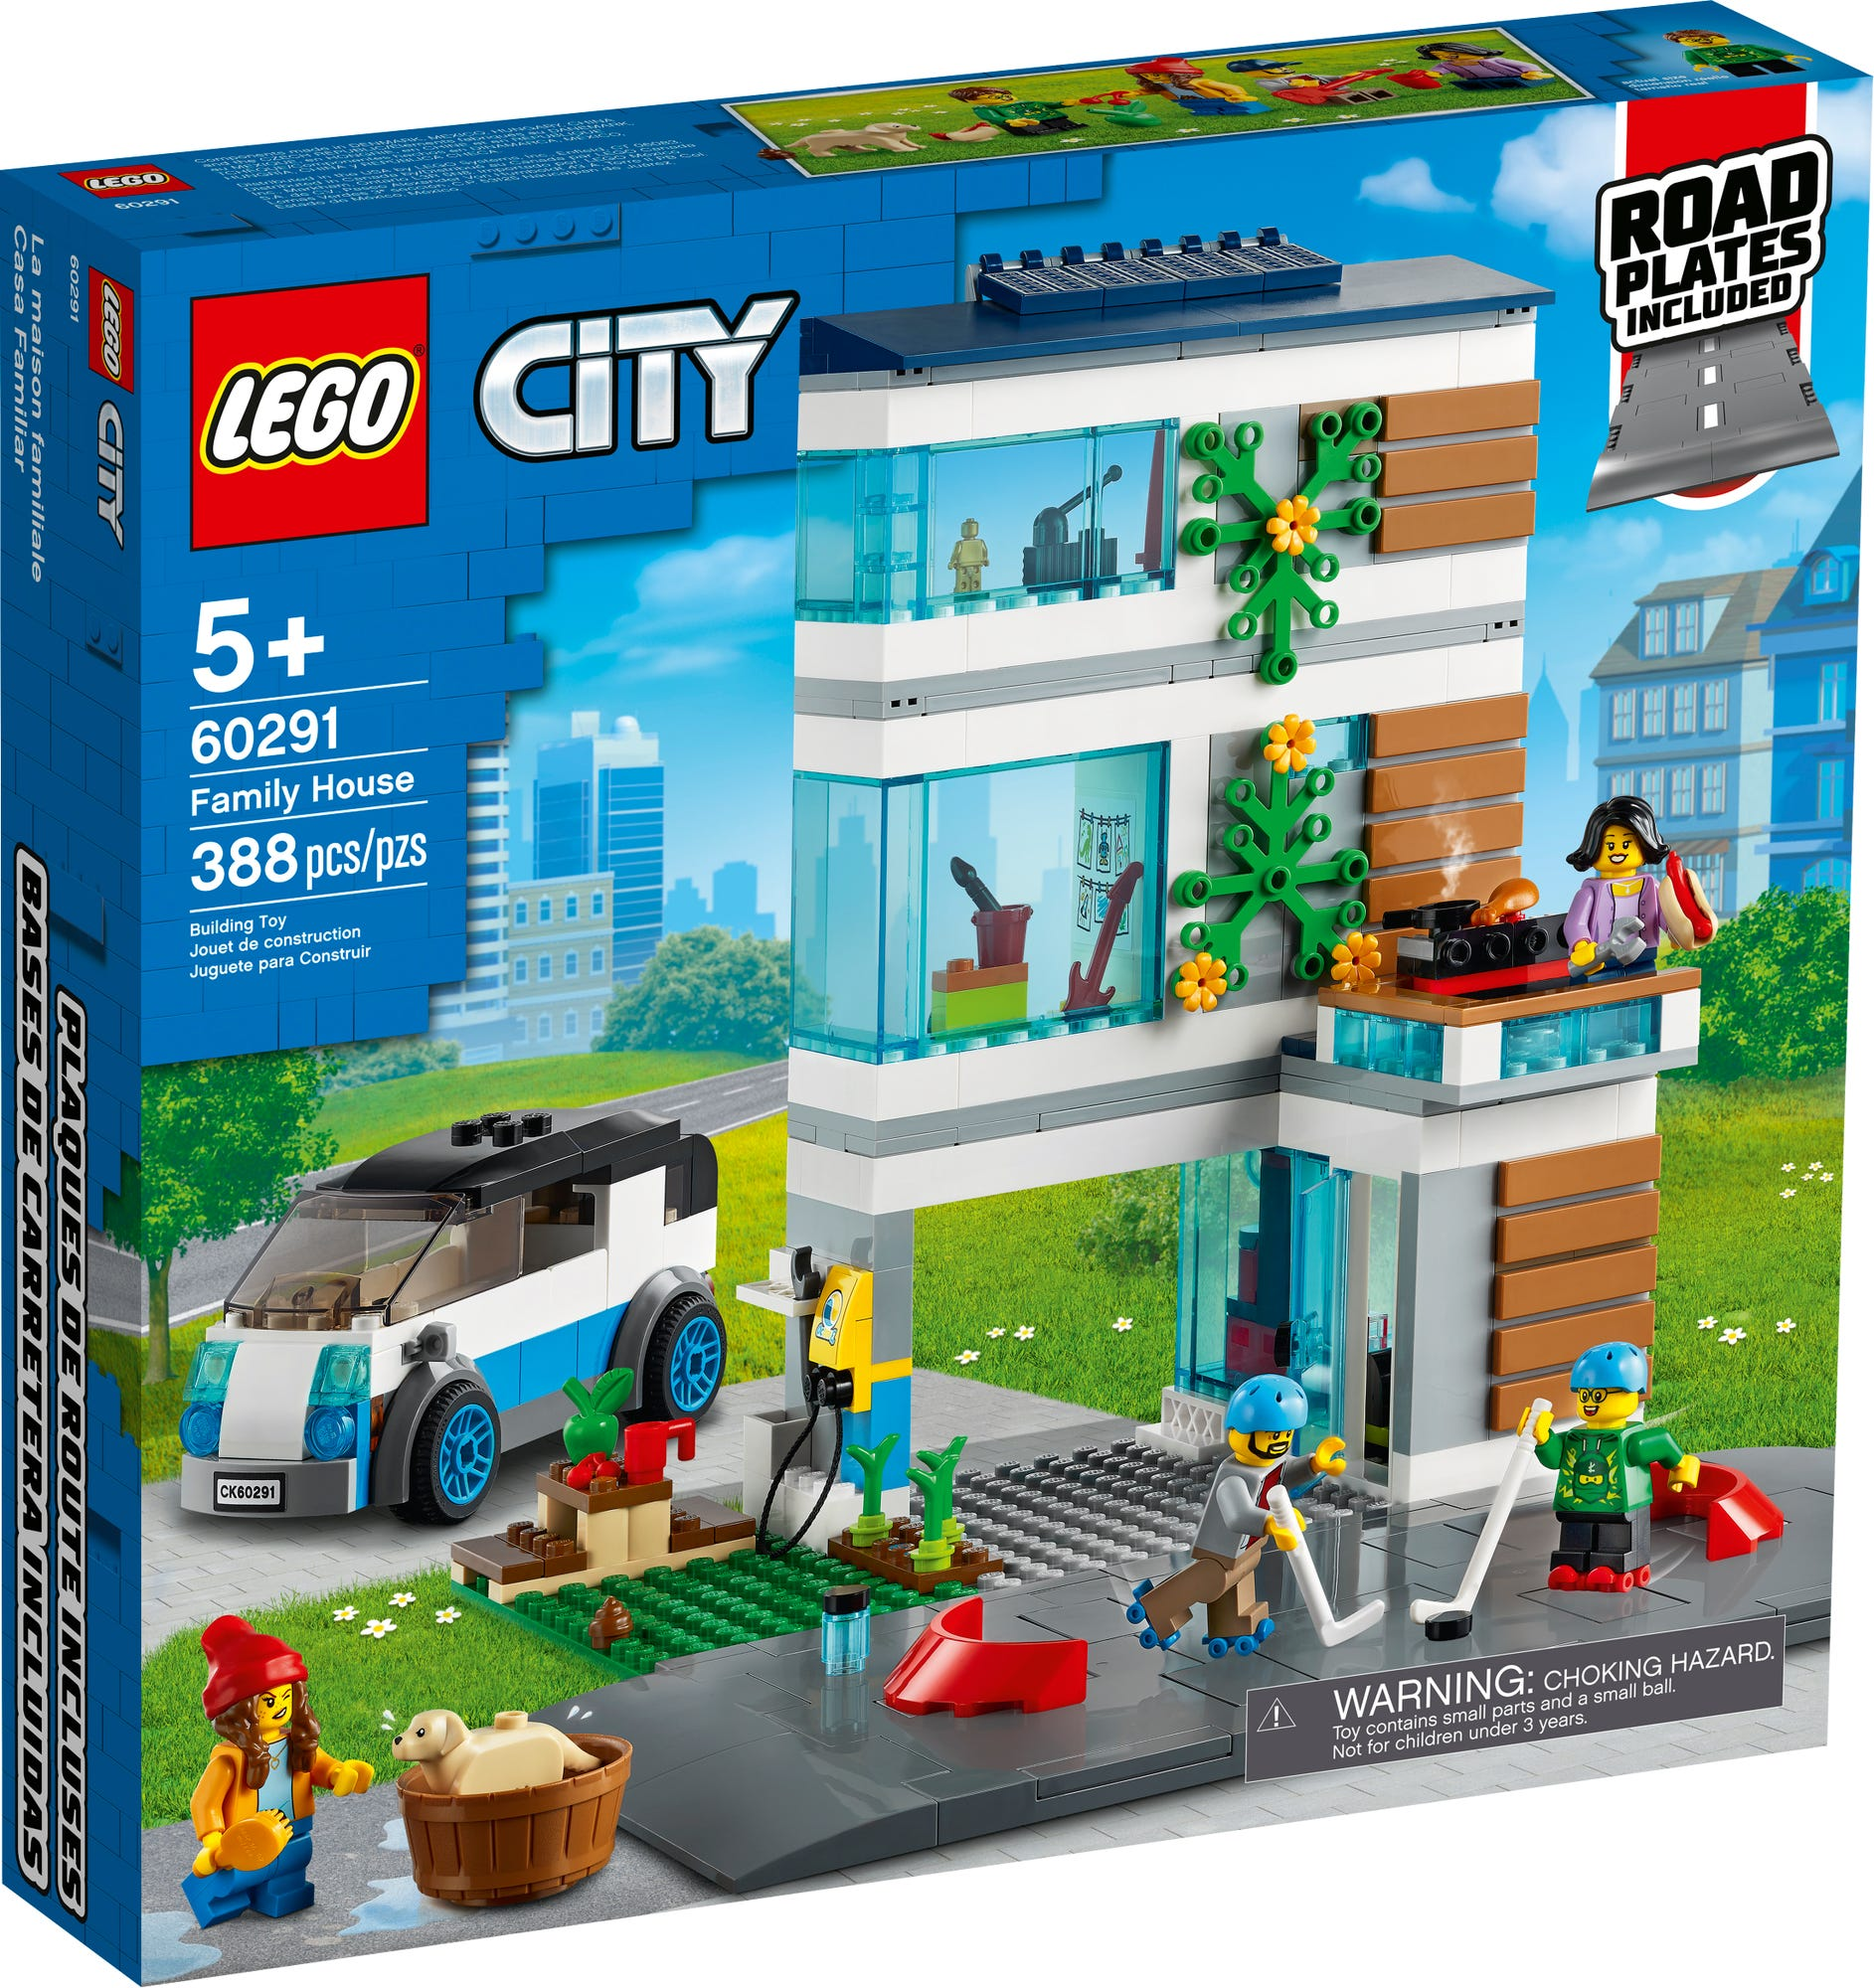 LEGO City 60291 Modernes Familienhaus (2)